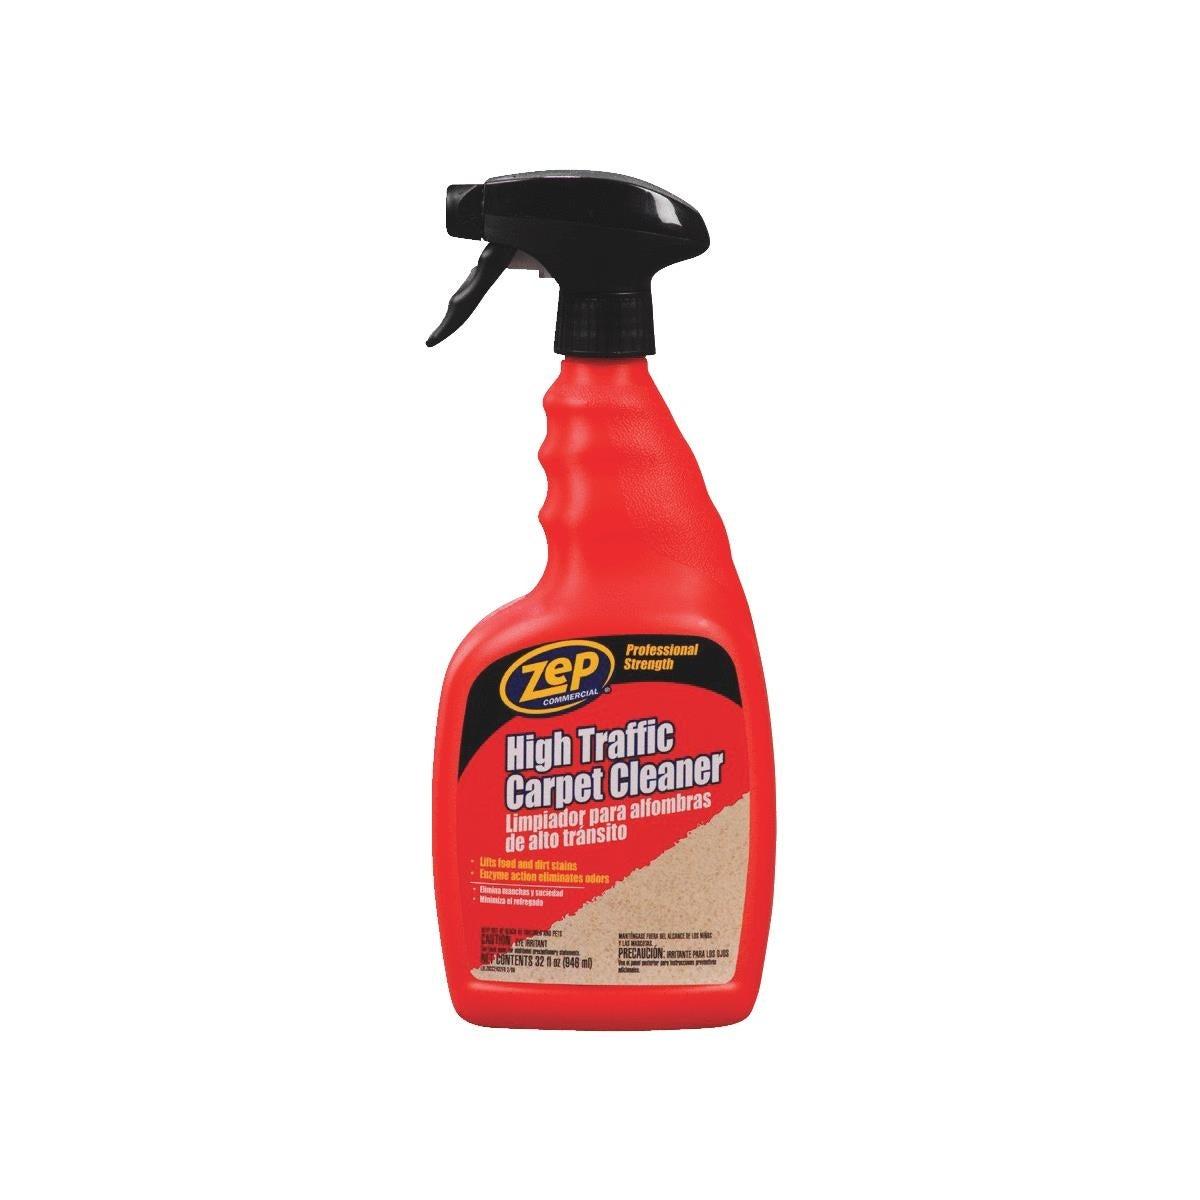 Zep High Traffic Carpet Cleaner Instructions Carpet